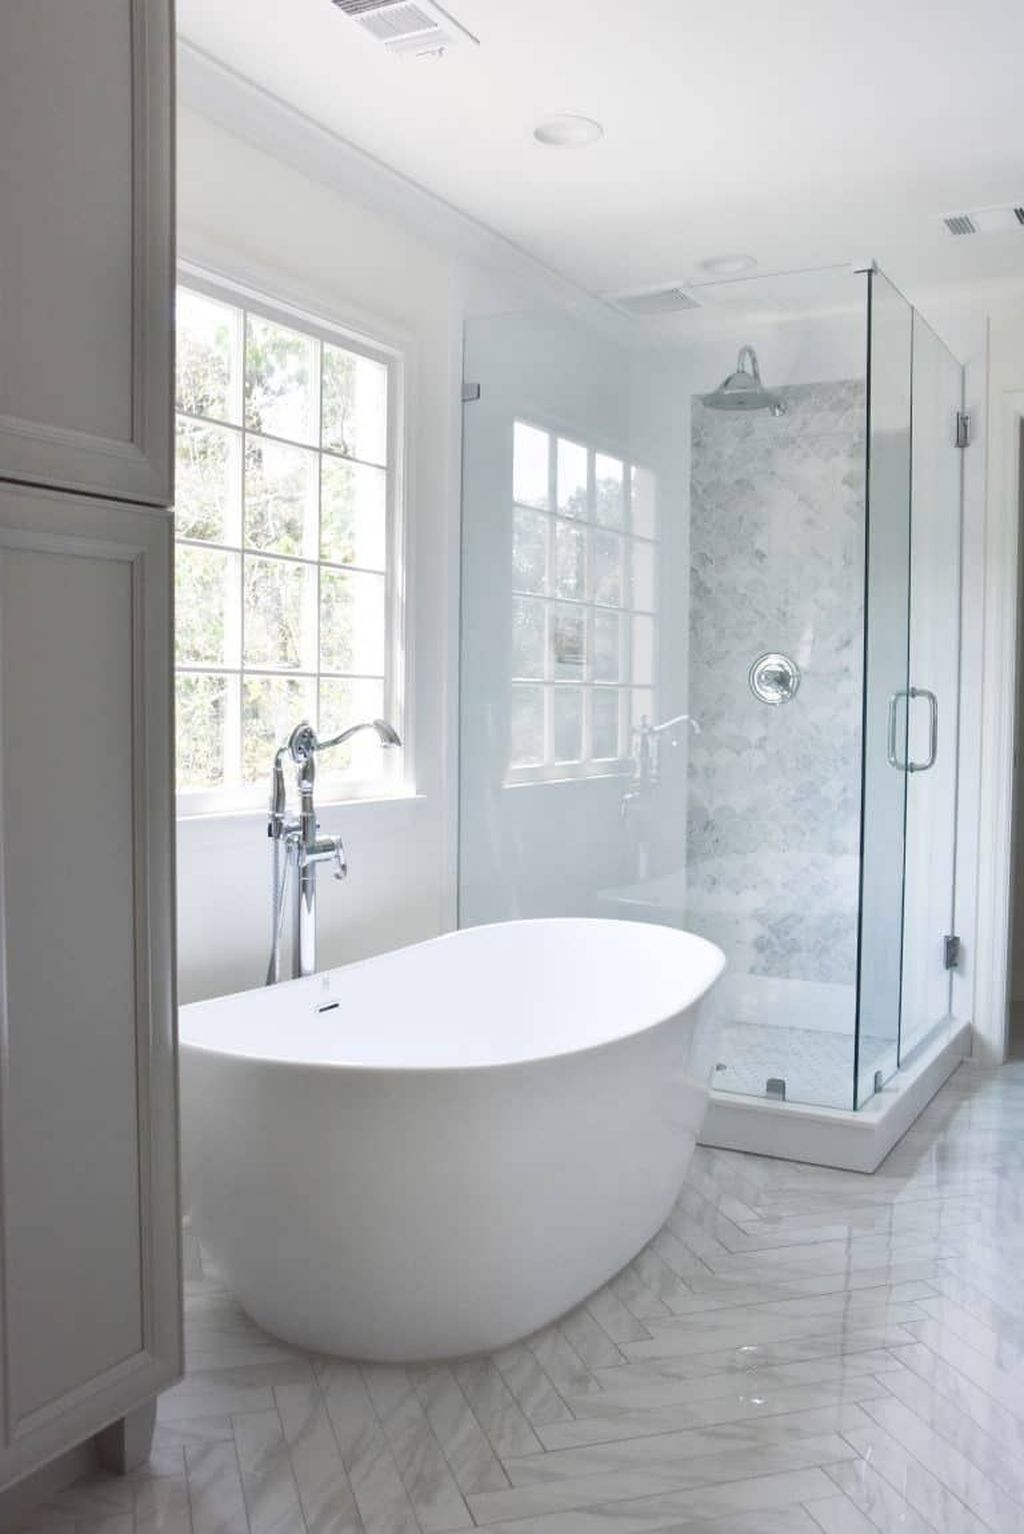 Unusual Bathroom Design Ideas You Need To Know 39